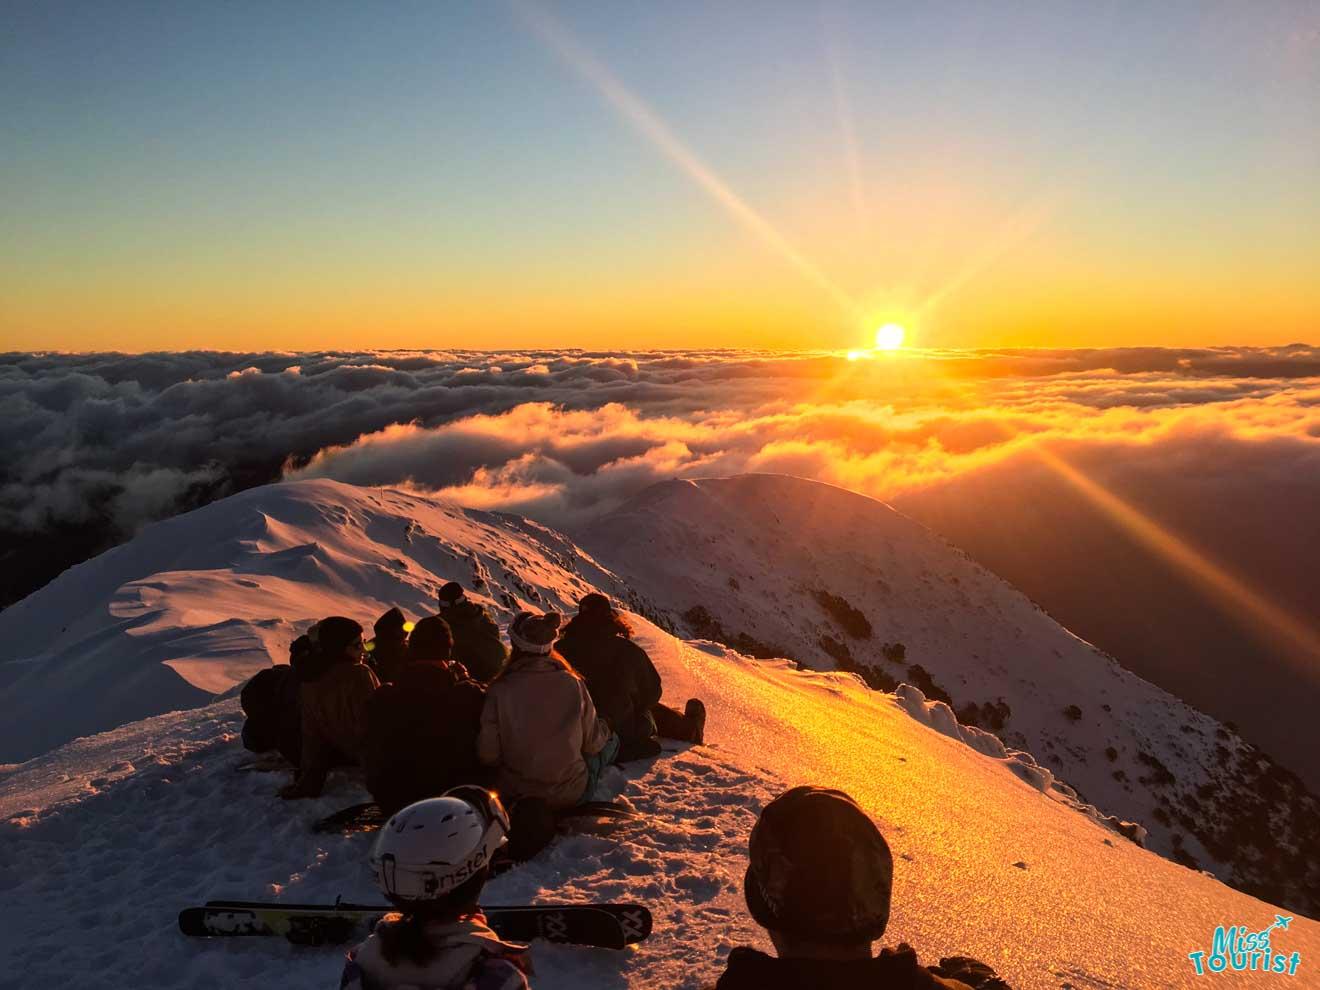 The 5 Best Ski Resorts in Australia -friends Mt Buller or Mt Hotham